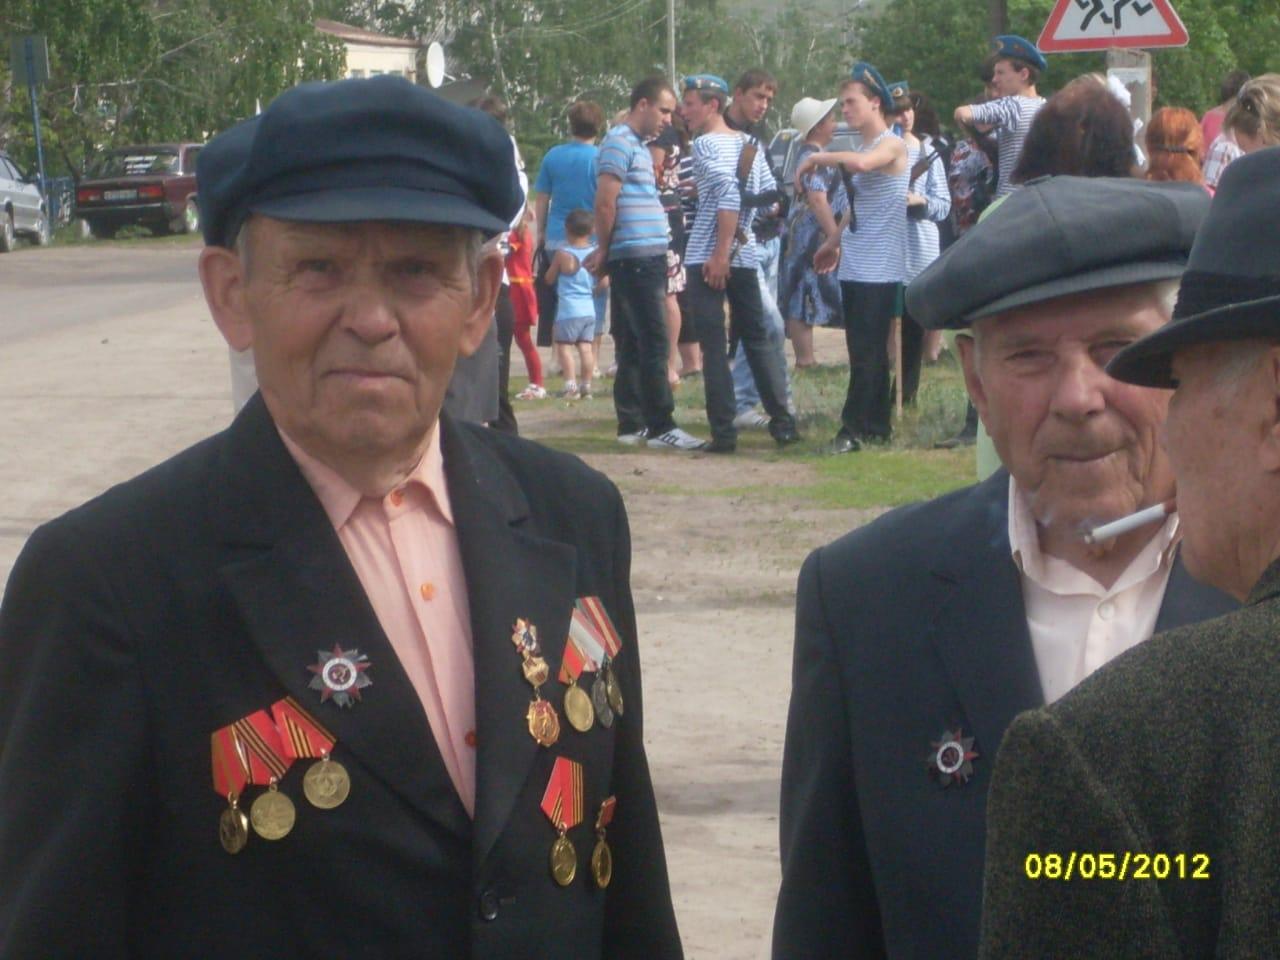 http://vrnschool85.ucoz.ru/111/IMG-20200508-WA0015.jpg